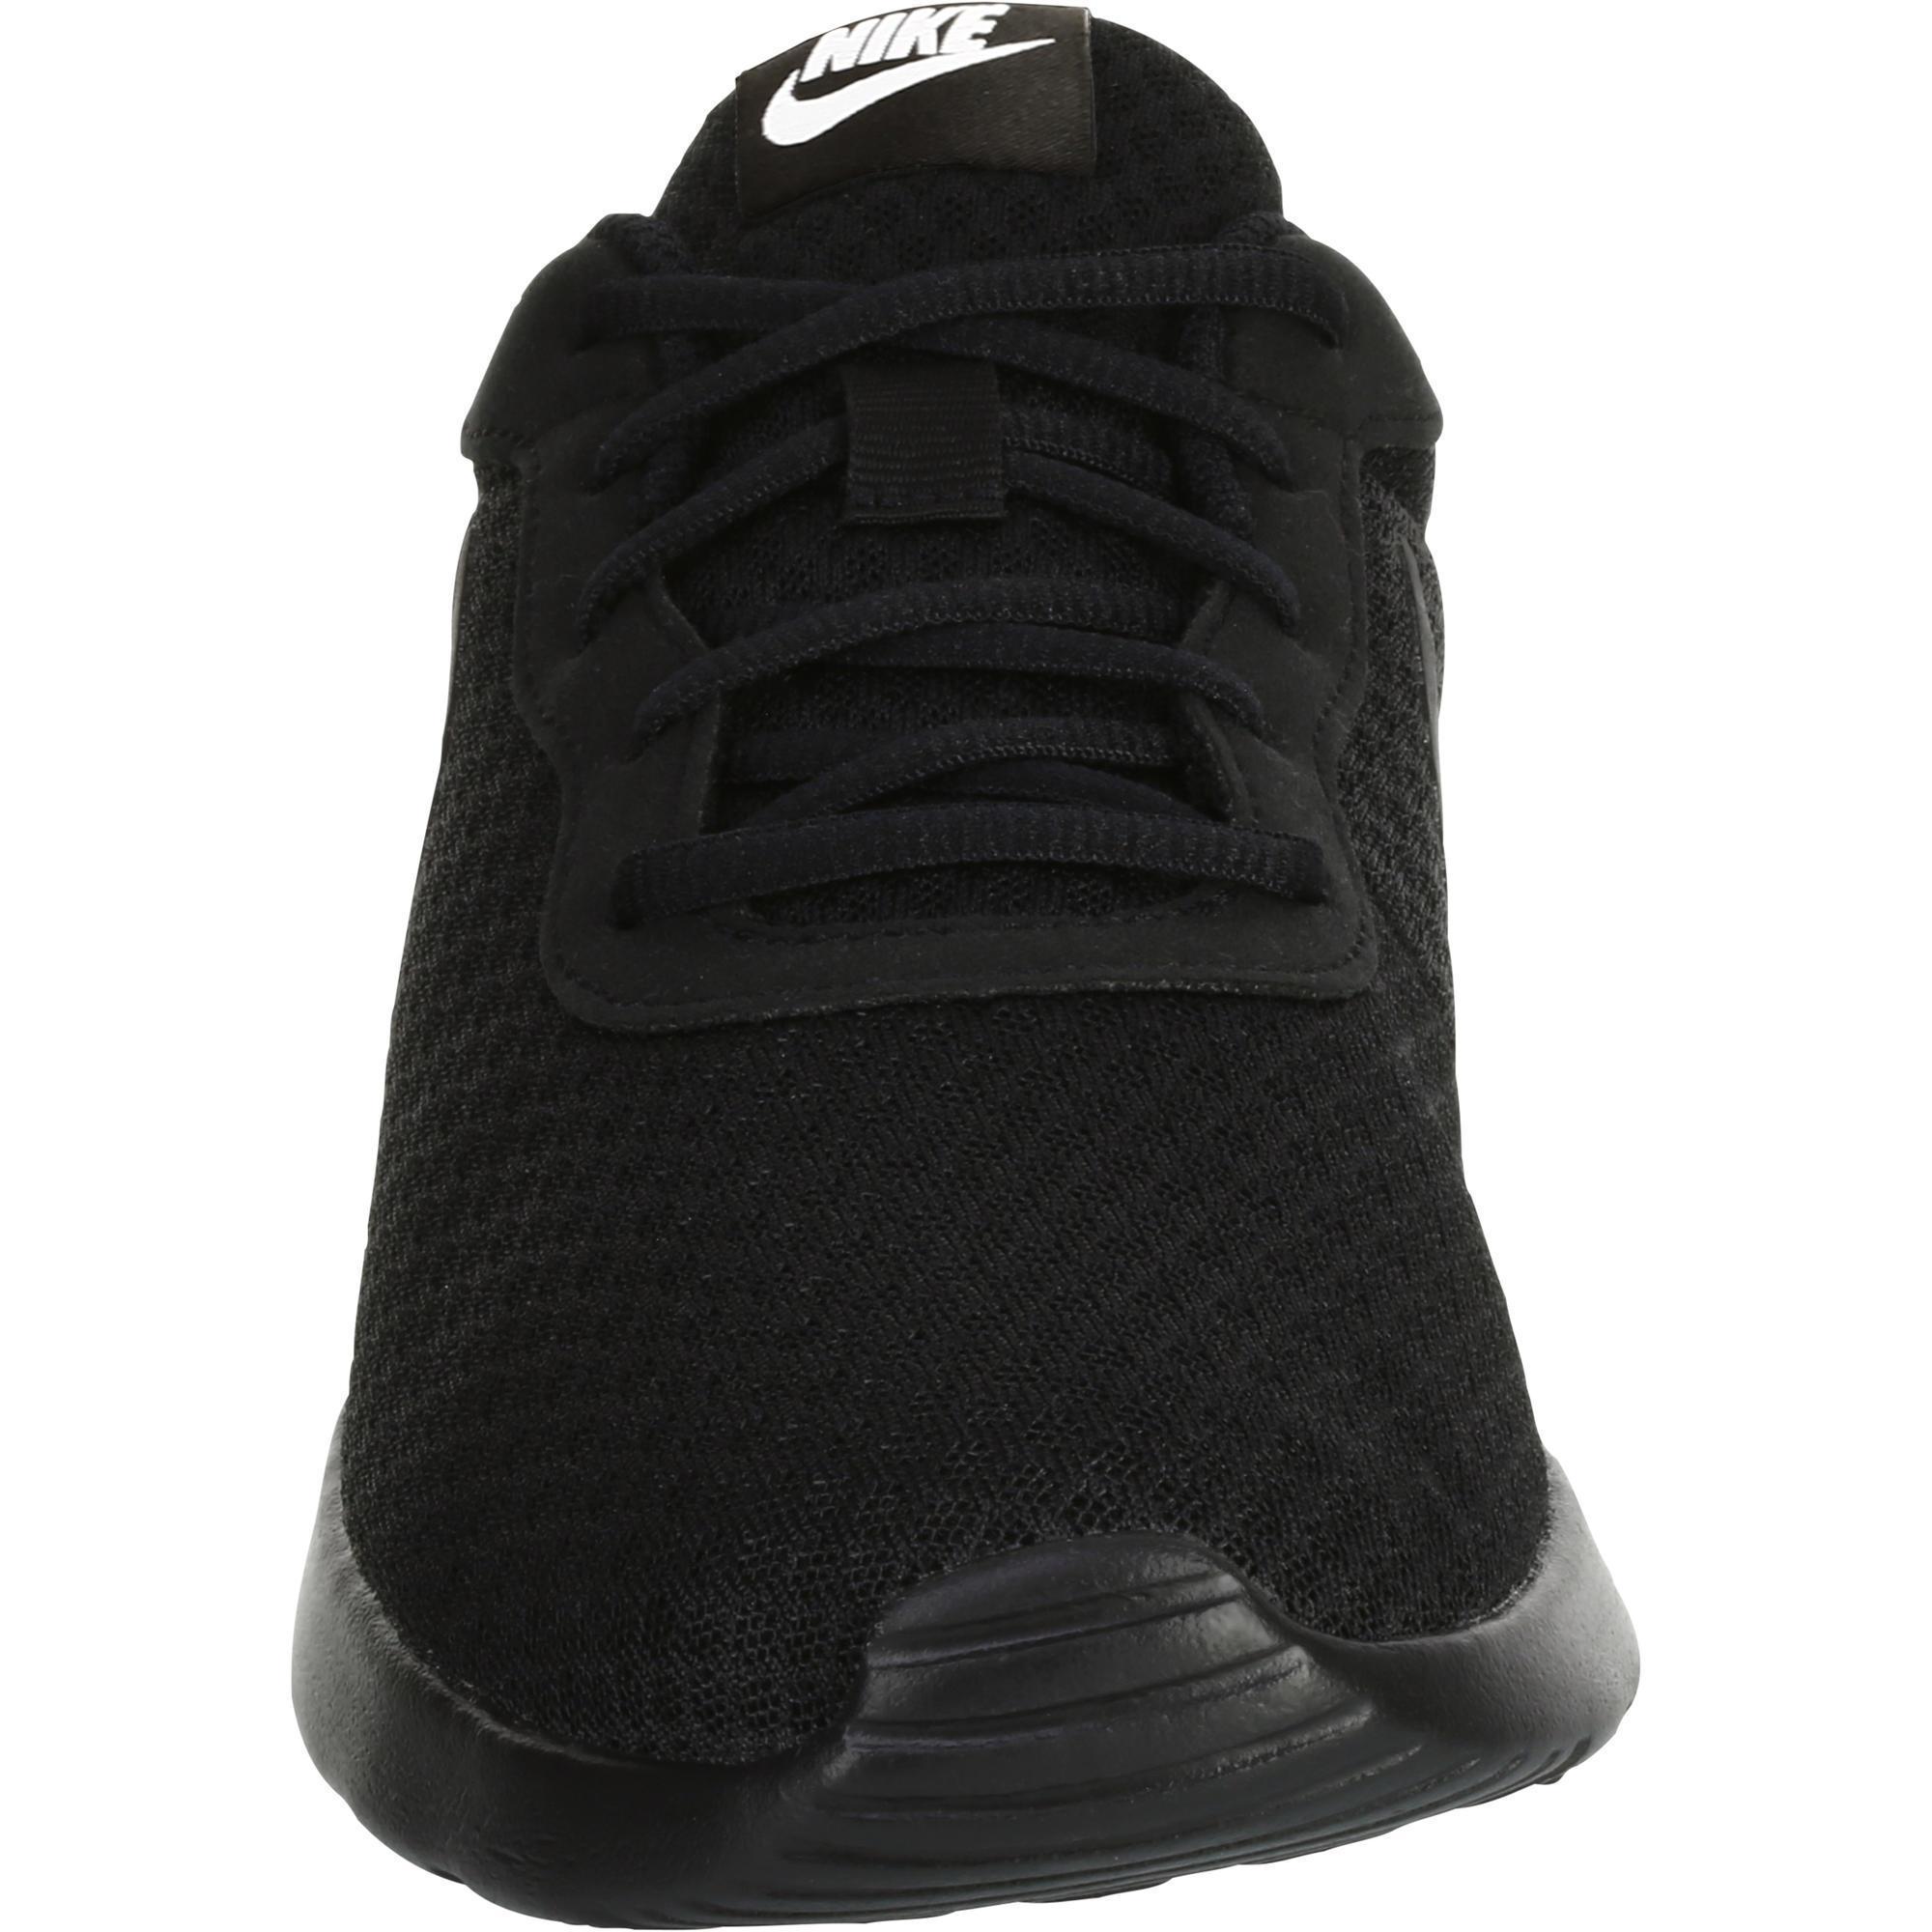 0305d97289c76 Chaussures marche sportive femme Tanjun noir ...